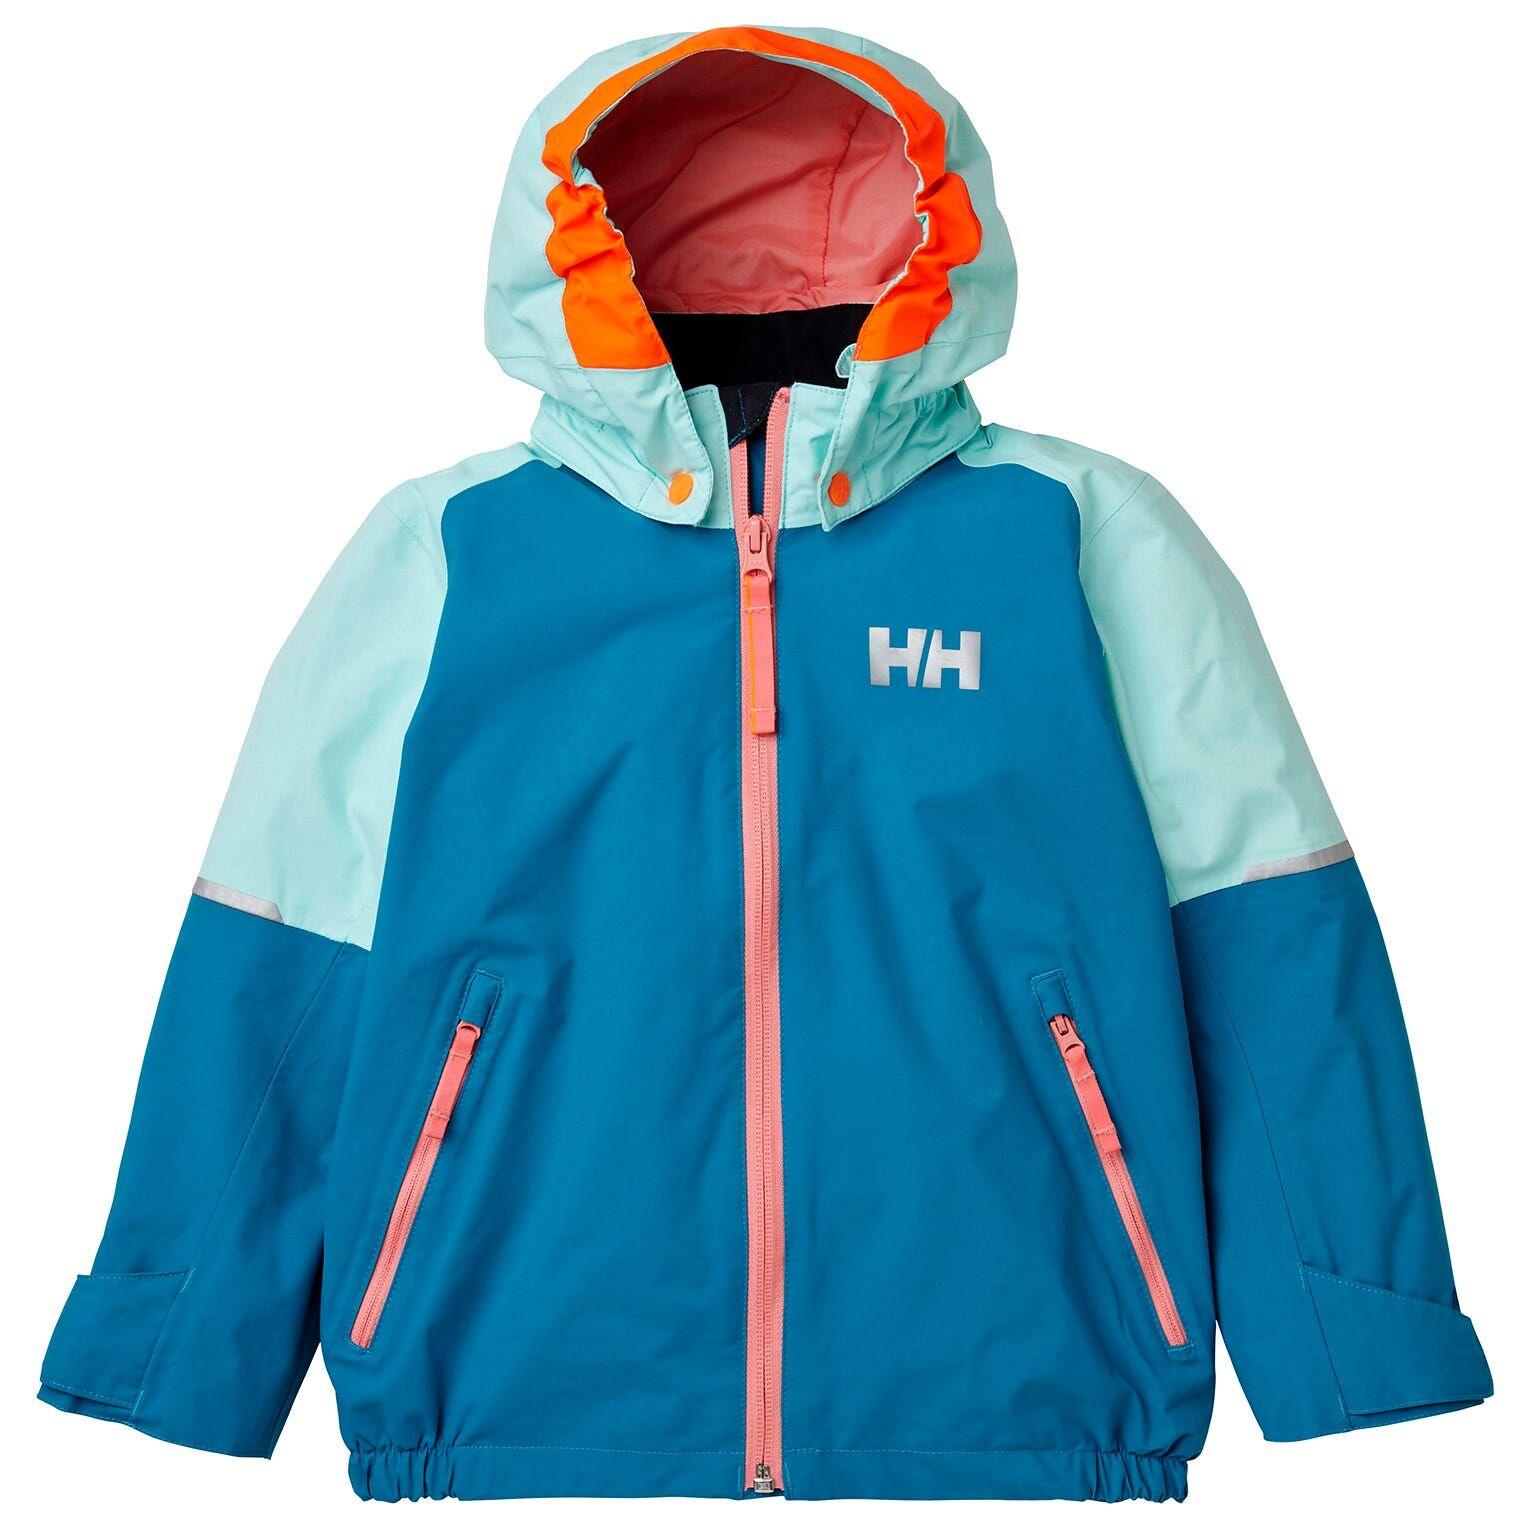 Helly Hansen Kids Shelter Jacket Parka Blue 98/3